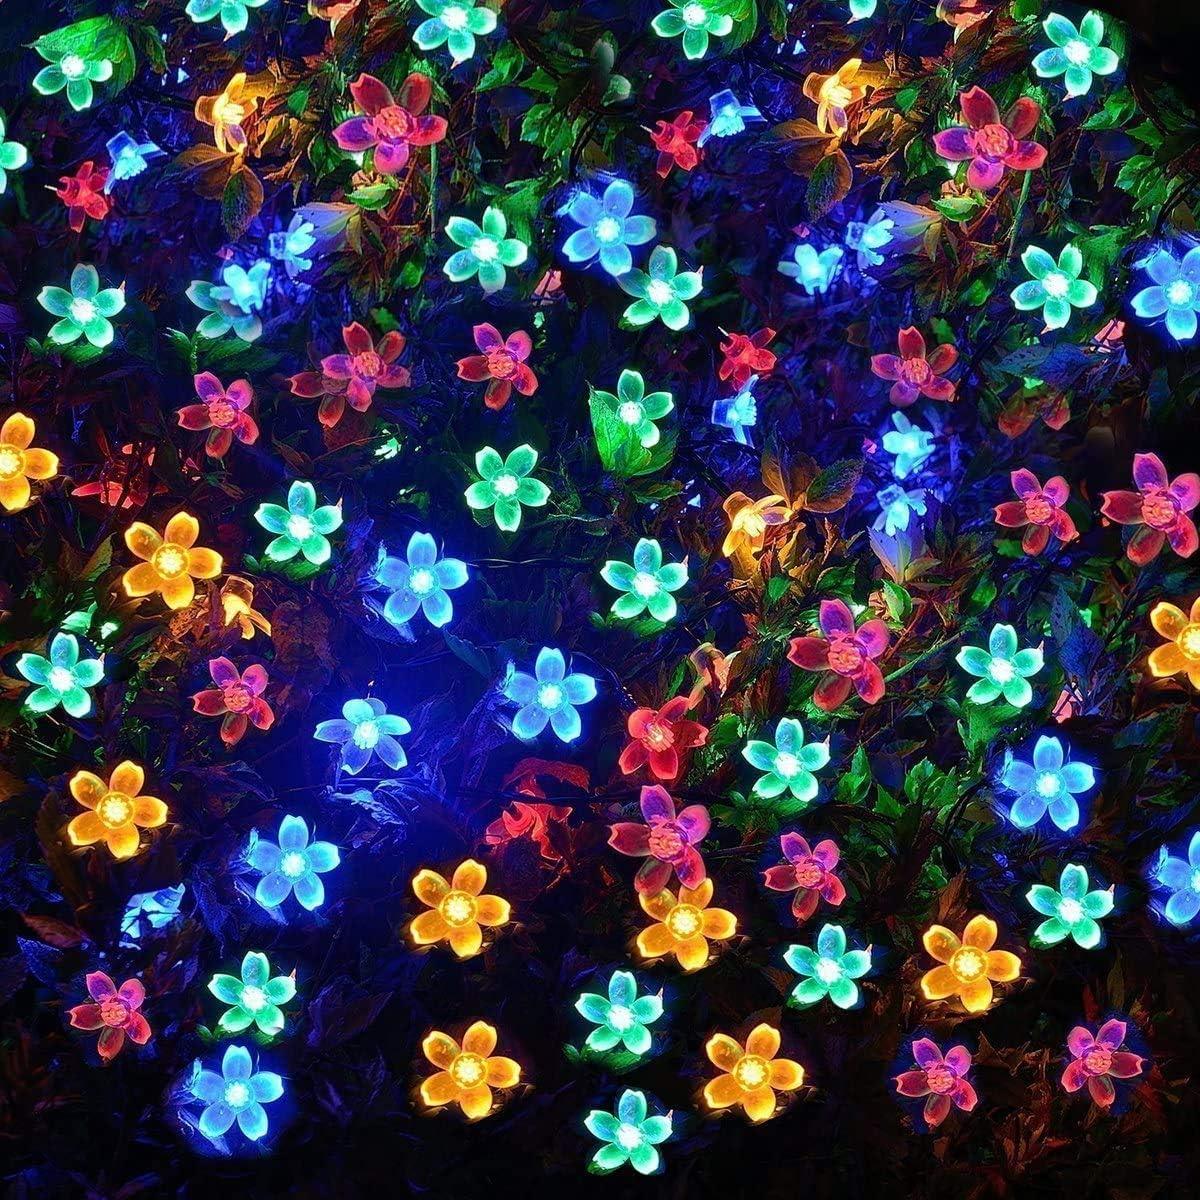 VMANOO Solar Outdoor Christmas String Lights 21ft 50 LED Fairy Flower Blossom Decorative Light for Indoor Garden Patio Party Xmas Tree Decorations Multi-Color